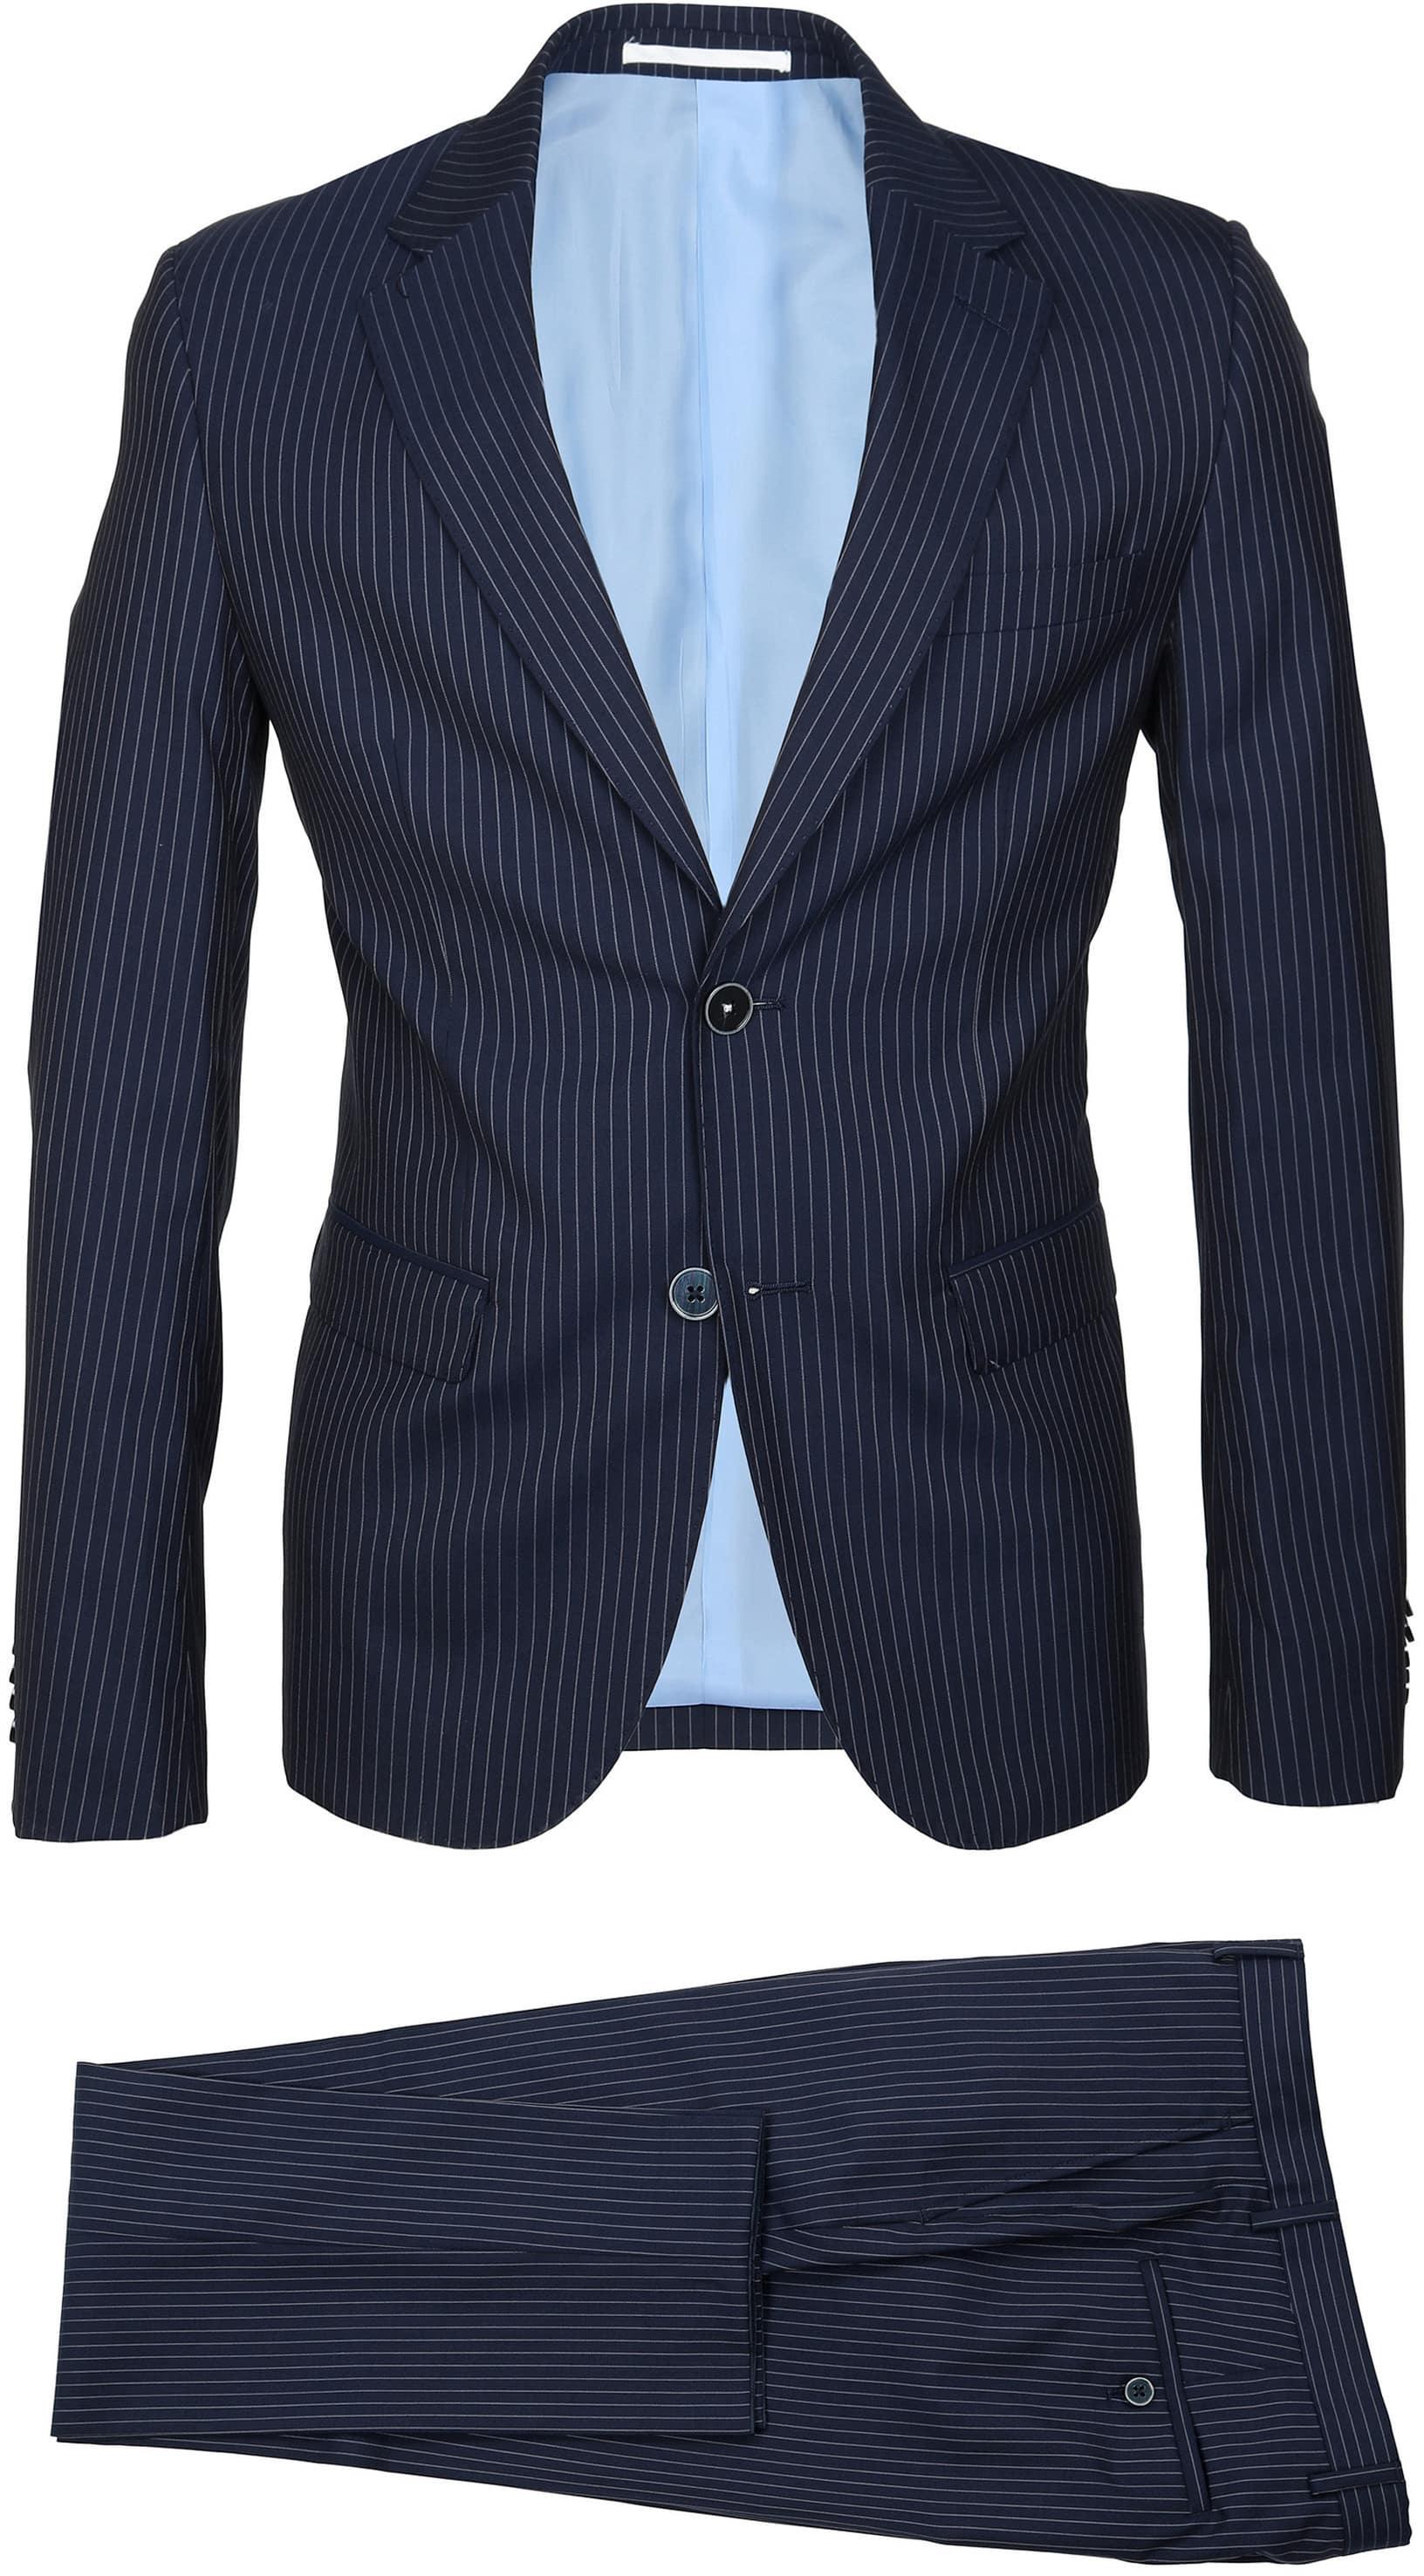 Suitable Anzug Strato Streifen Dunkelblau foto 1